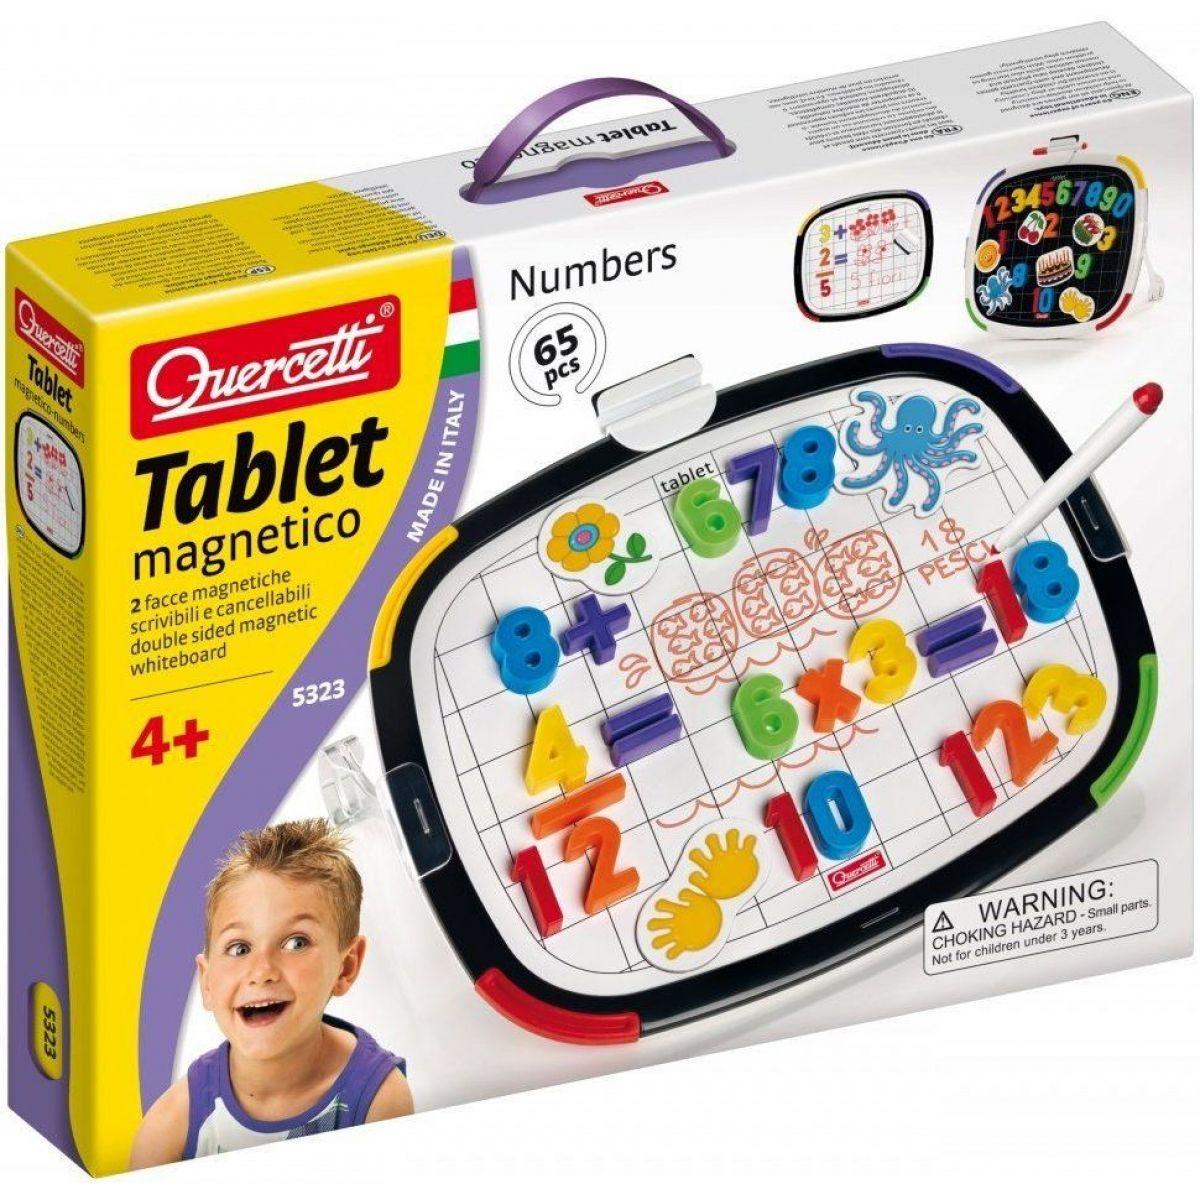 Quercetti Tablet Magnetico Numeri